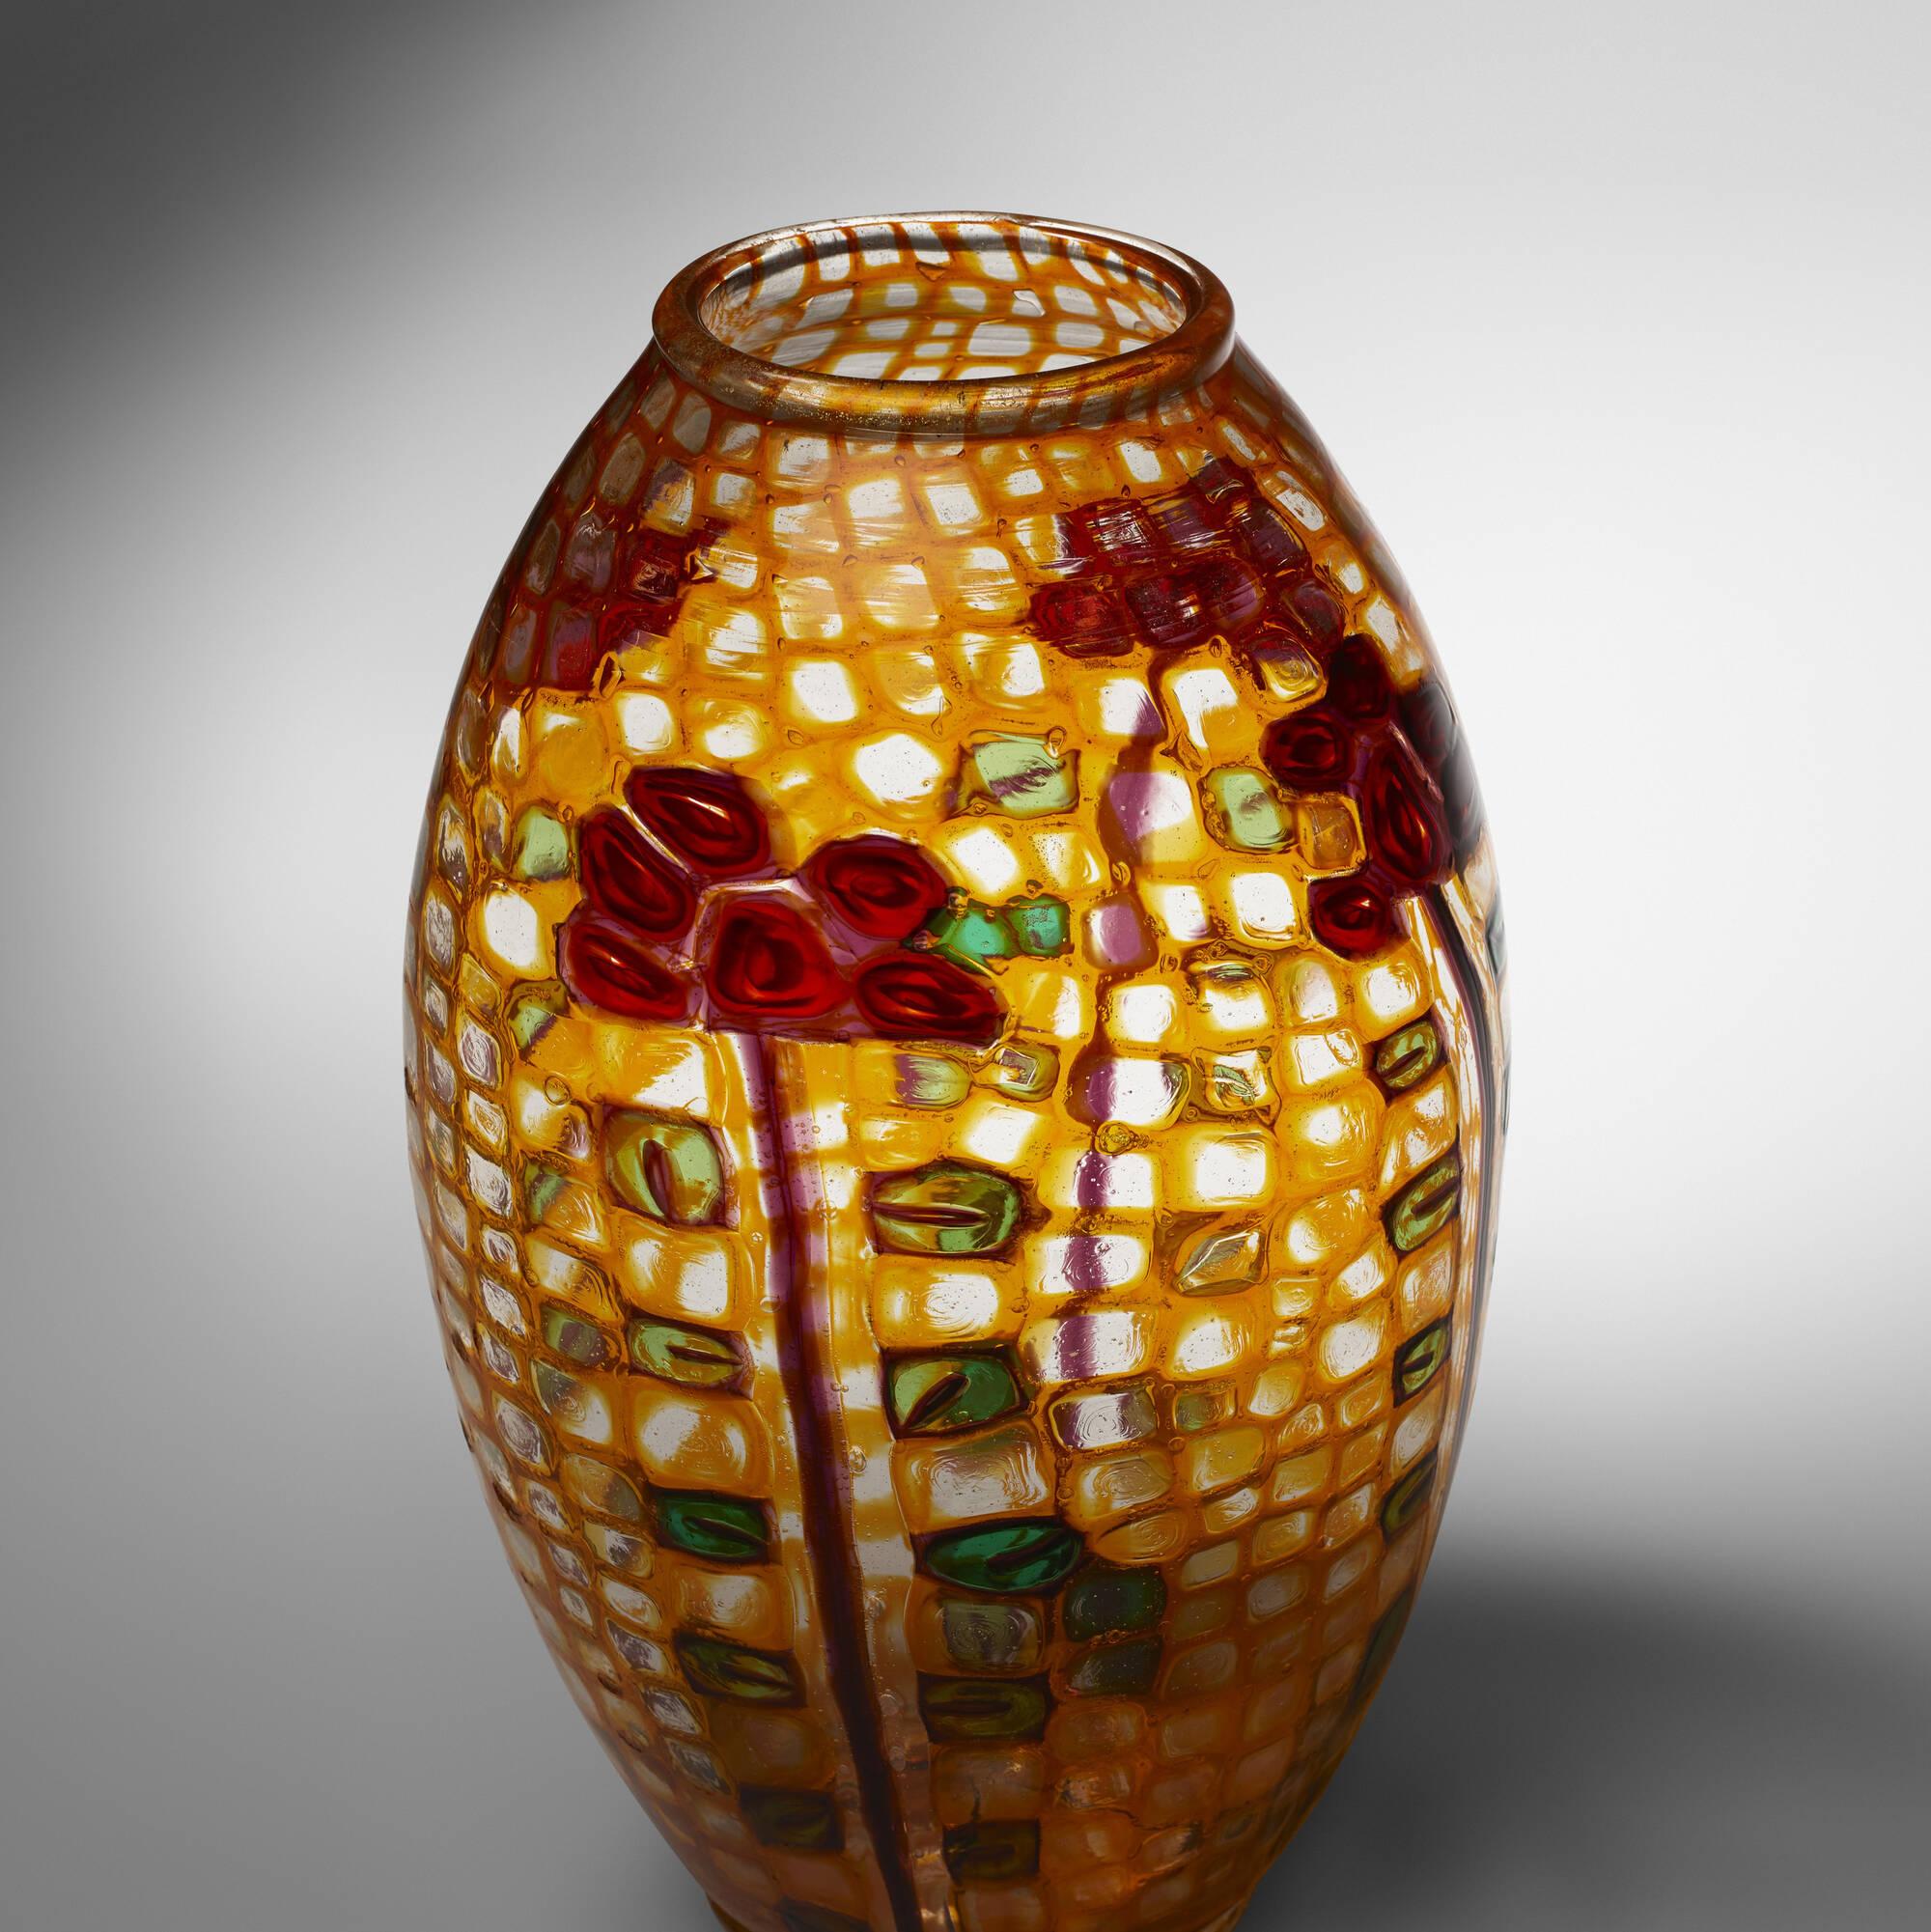 34: Ercole Barovier / Important Mosaico vase (2 of 4)